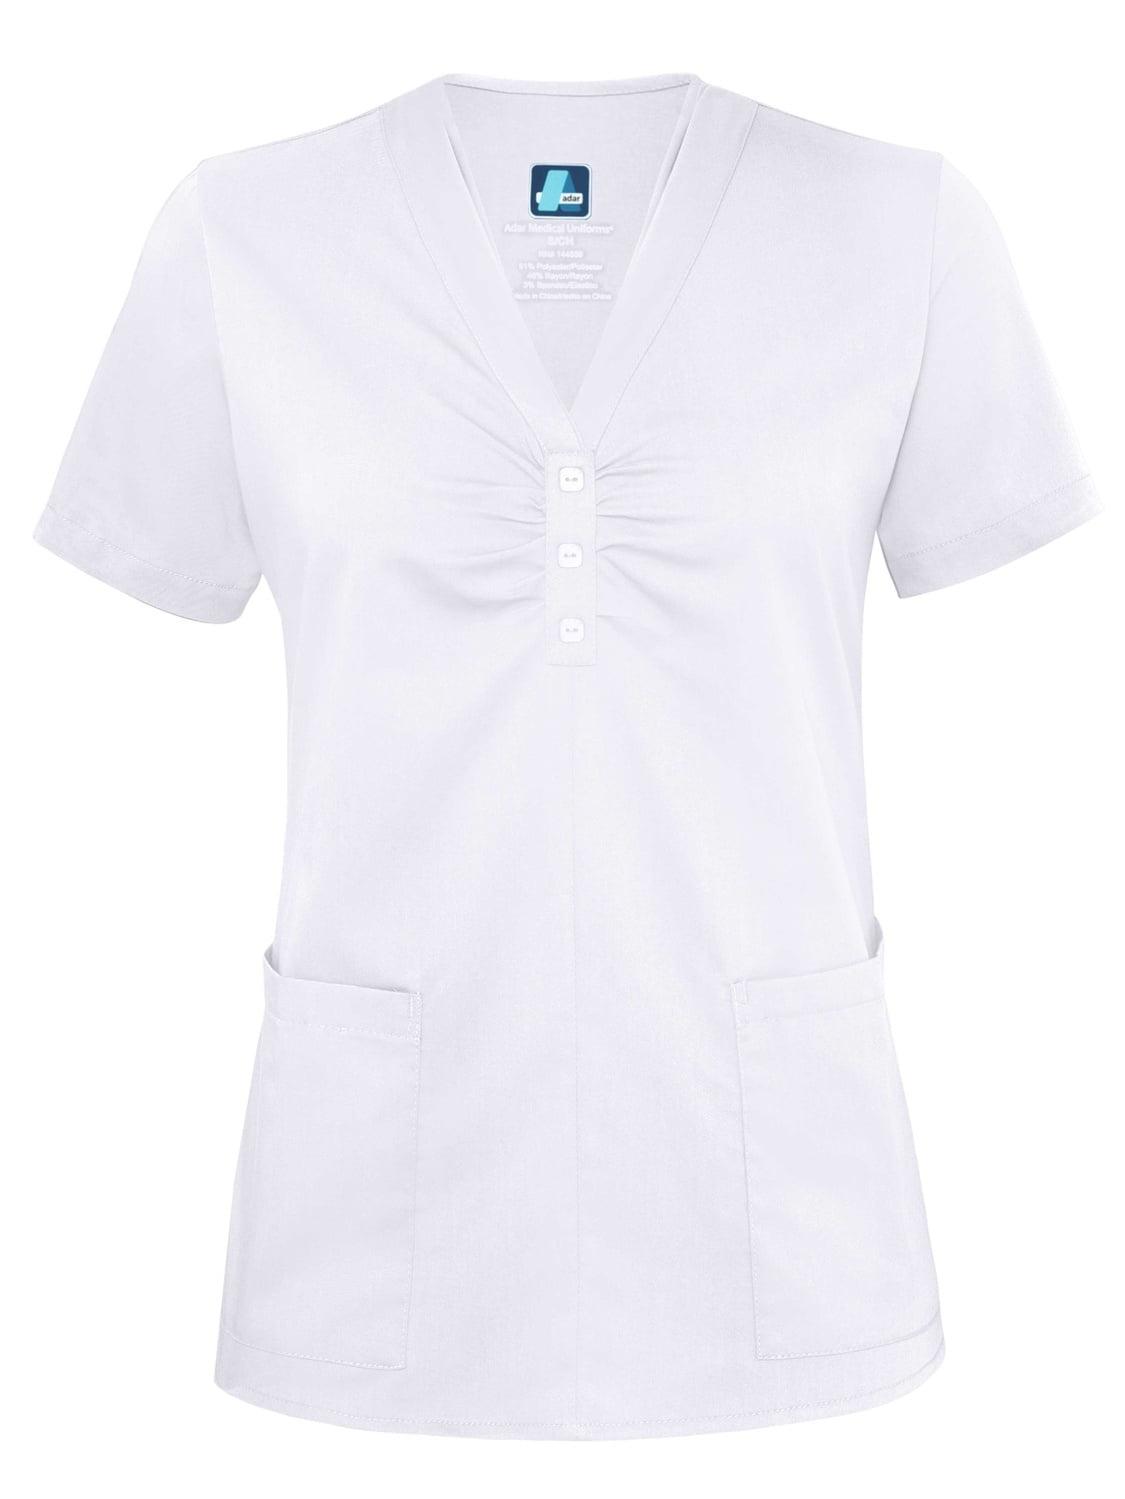 White Womens Tops T Shirts Walmart Com